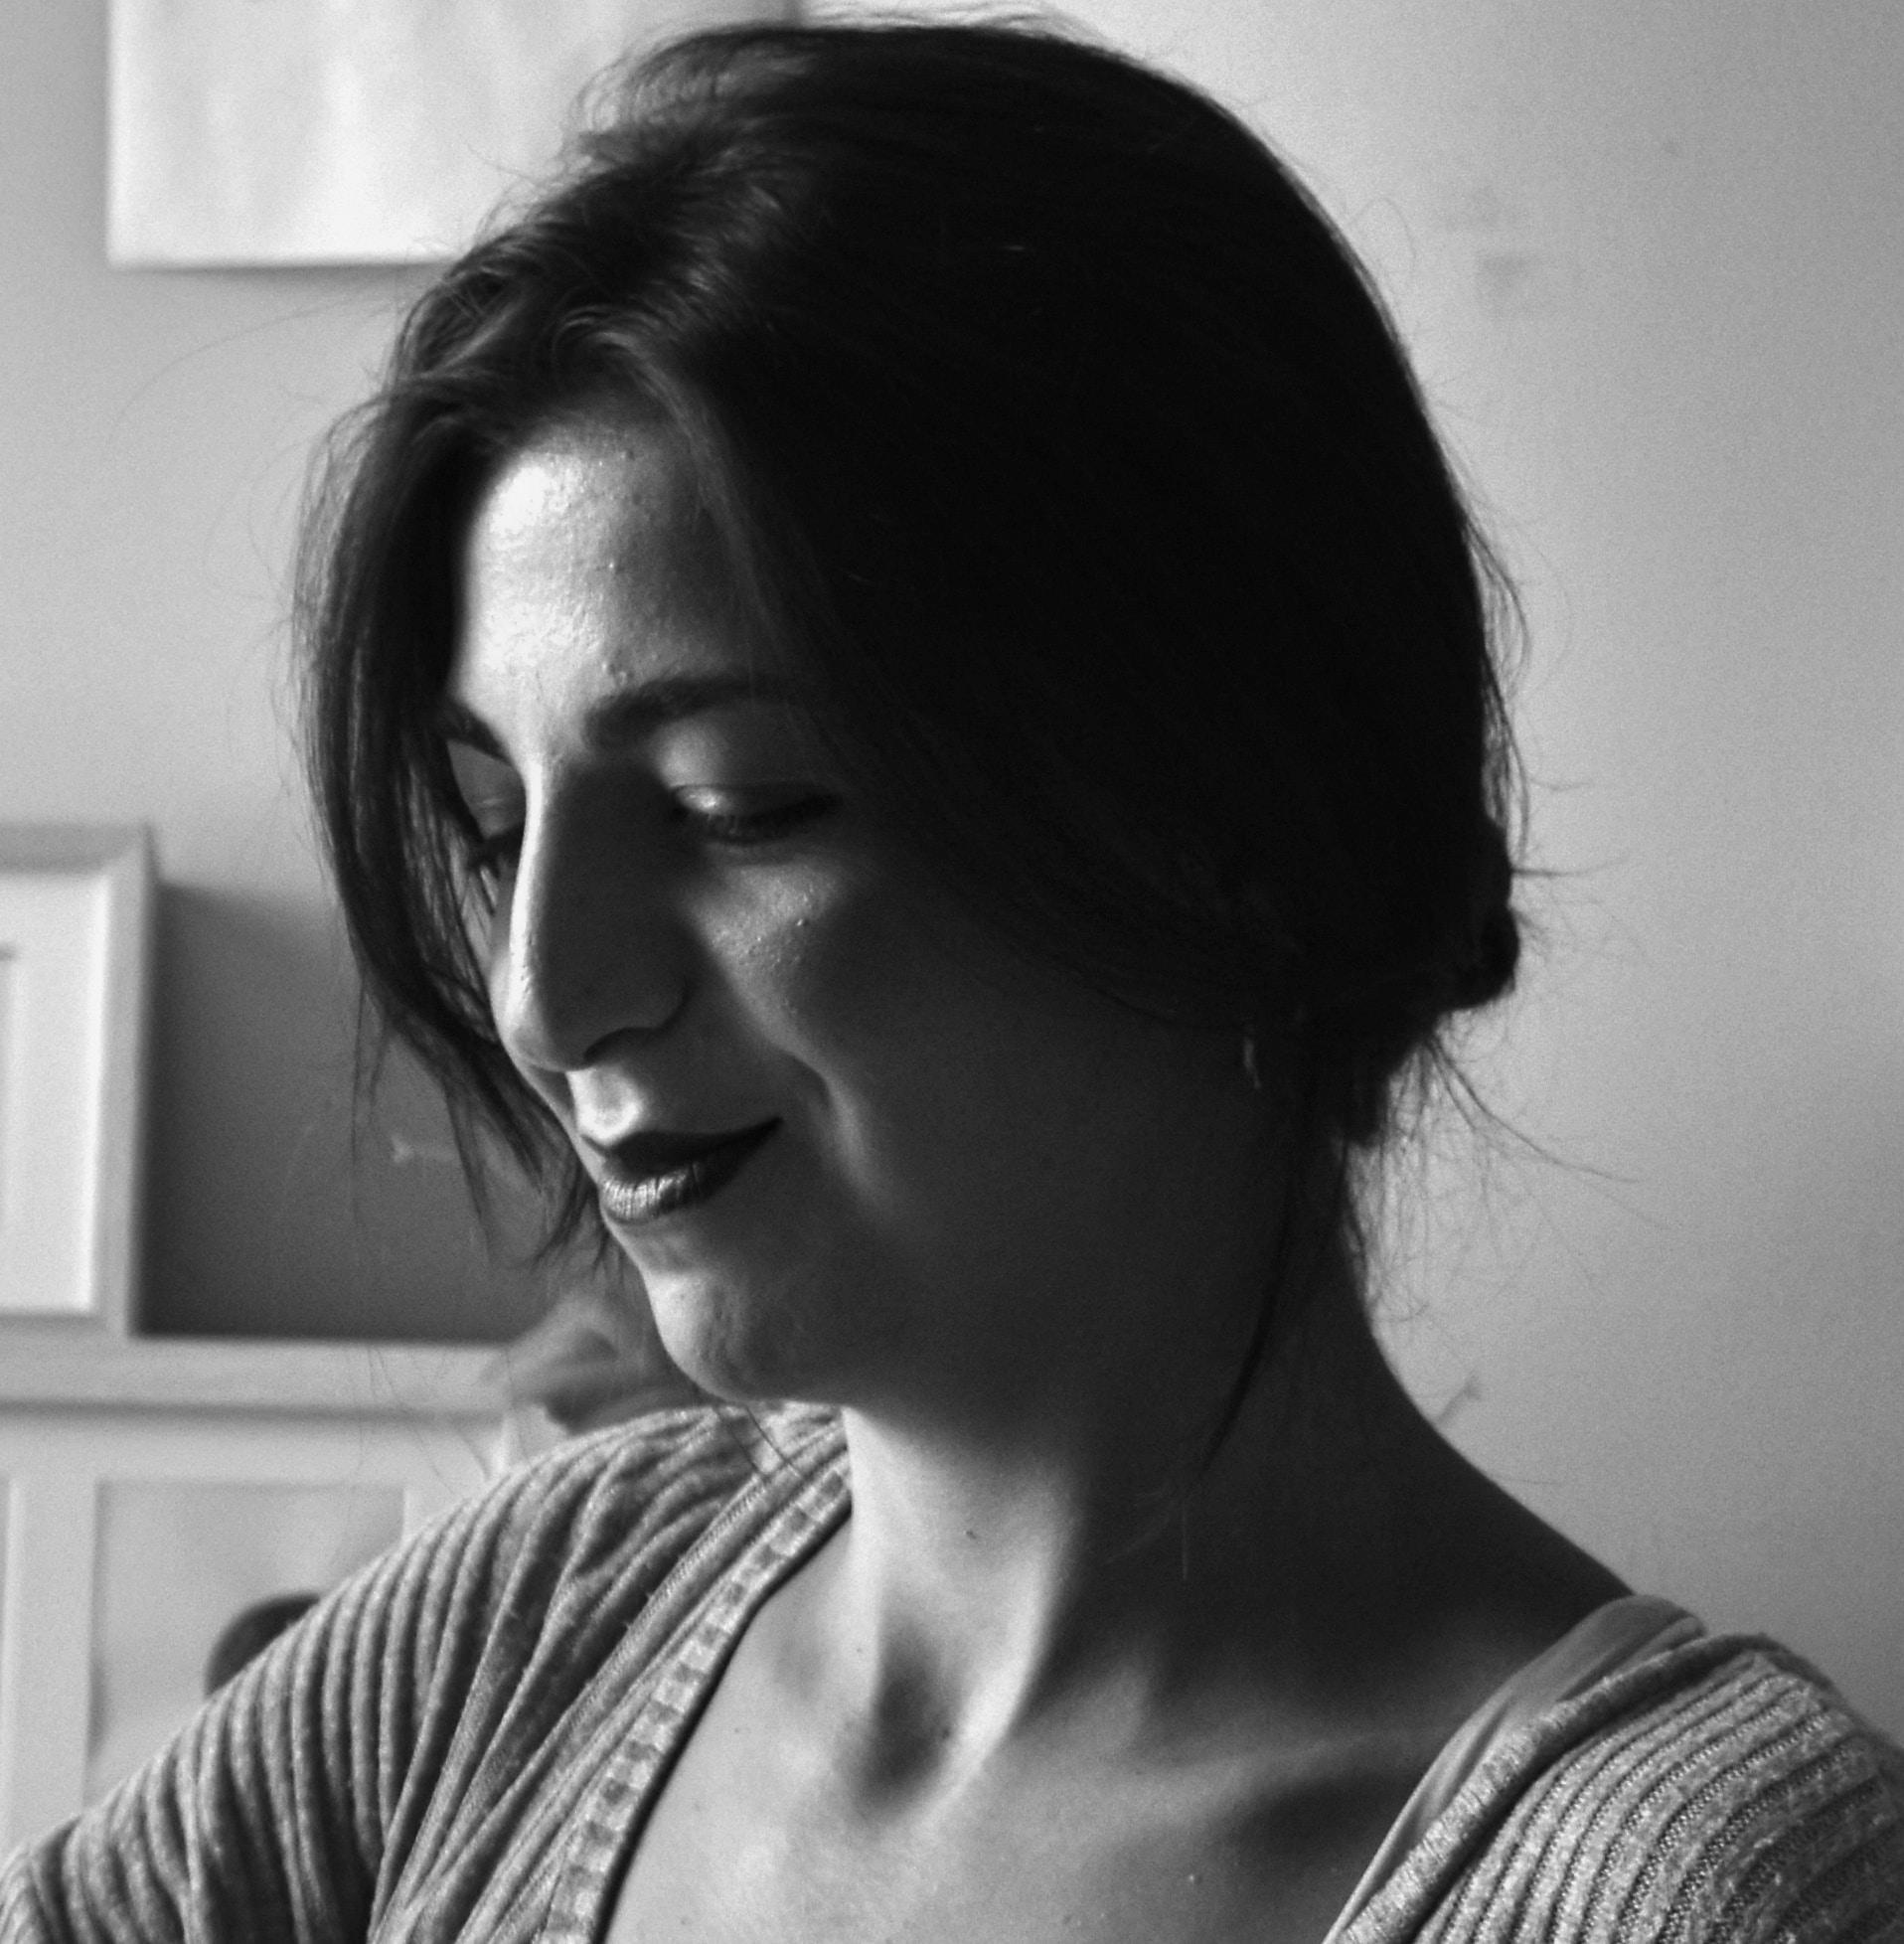 Go to Panagiota Altanopoulou's profile